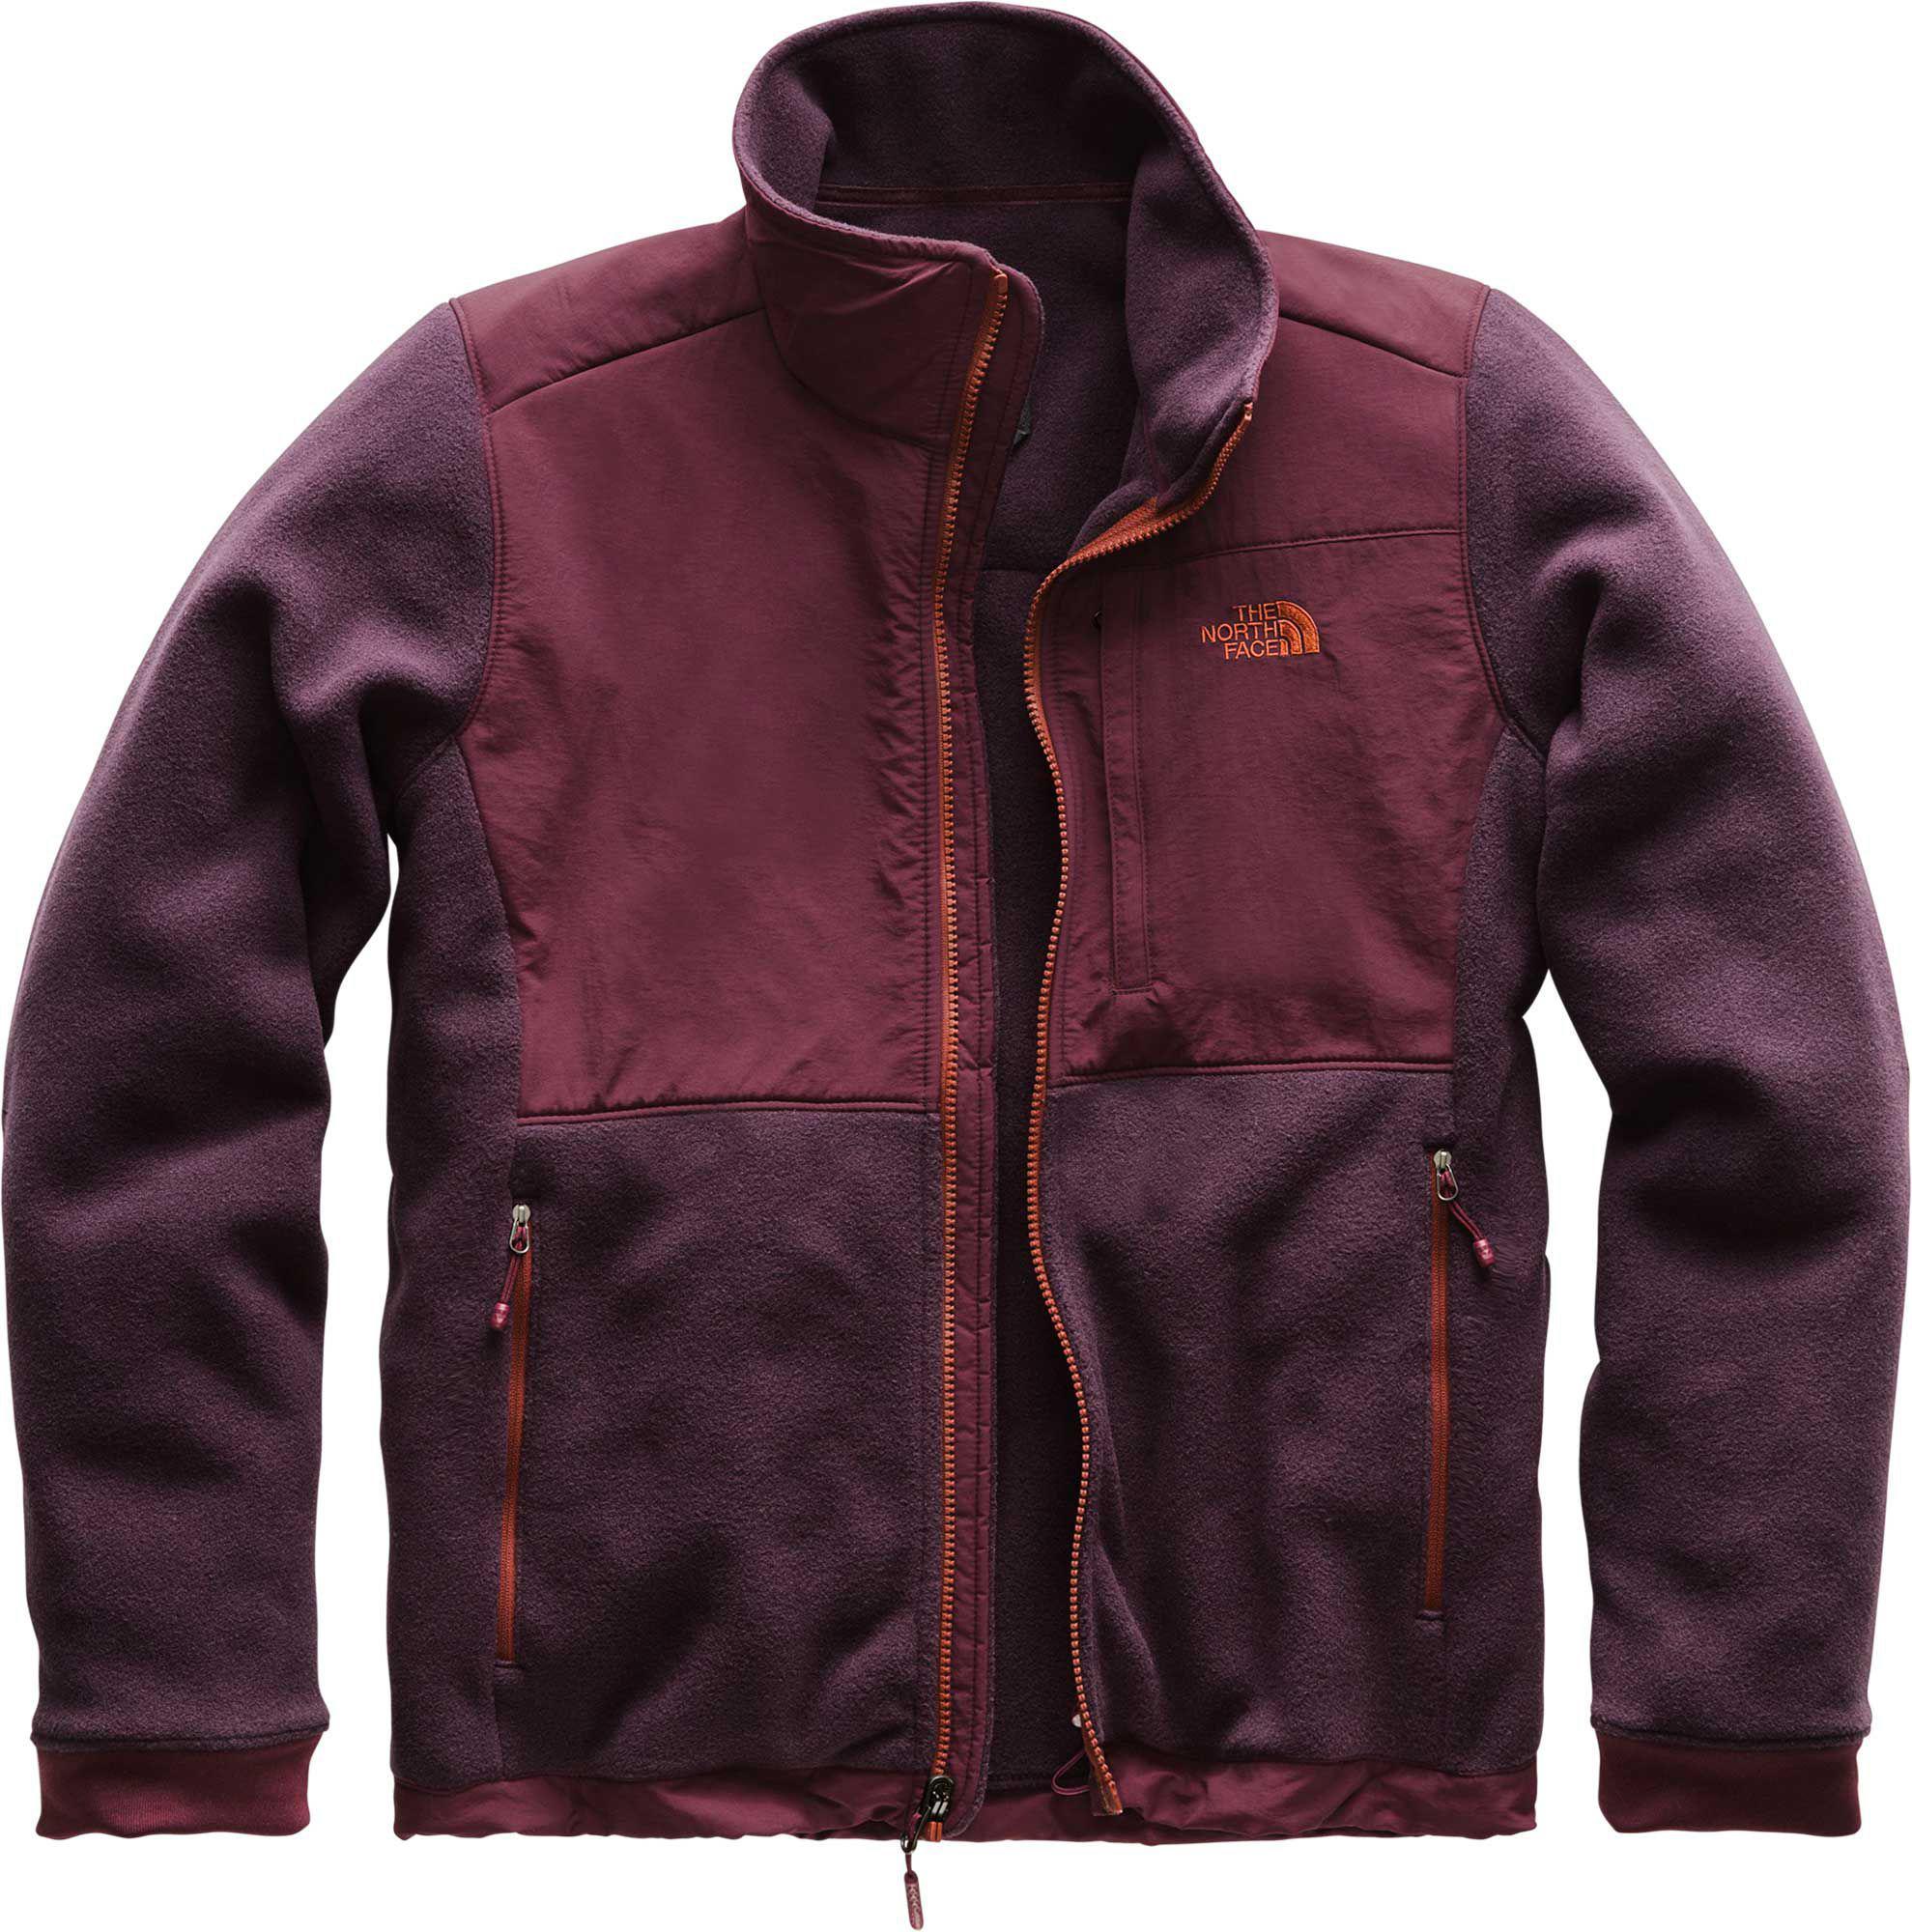 d13e625a461c Lyst - The North Face Denali 2 Fleece Jacket in Purple